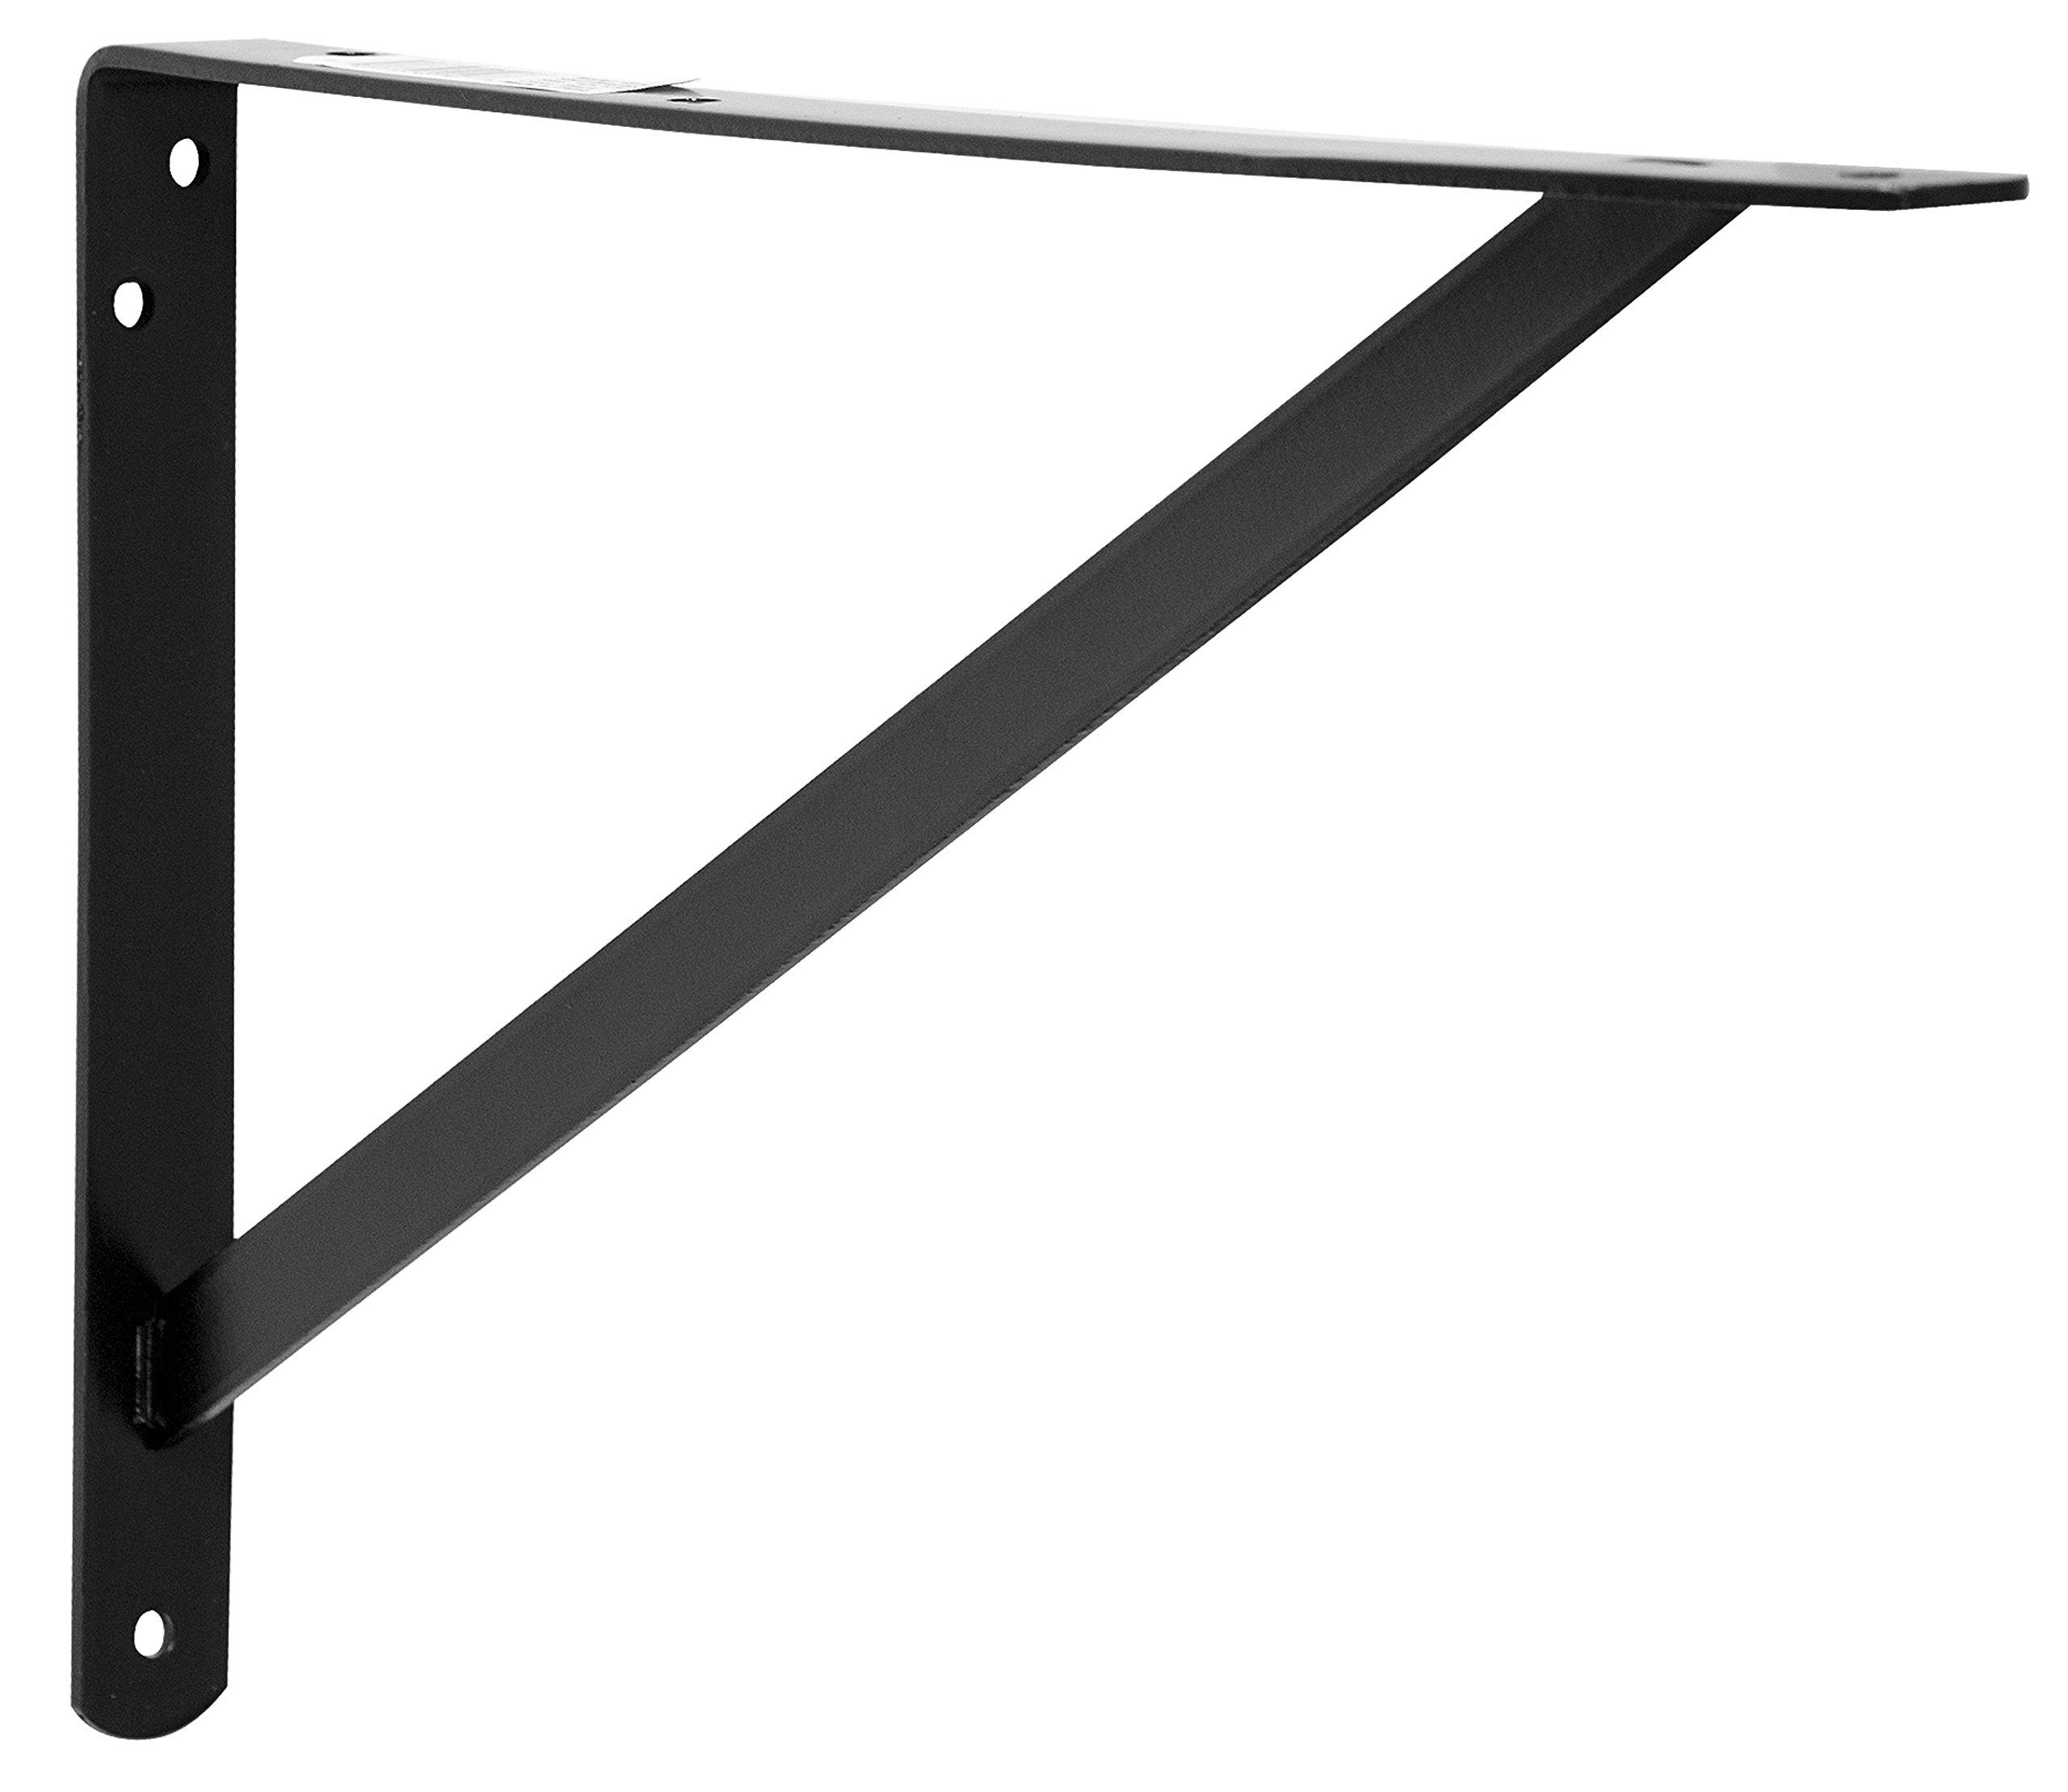 Decko 49147 Heavy Duty Shelf Bracket, 14.5-Inch by 10-Inch, Black, 10-Pack